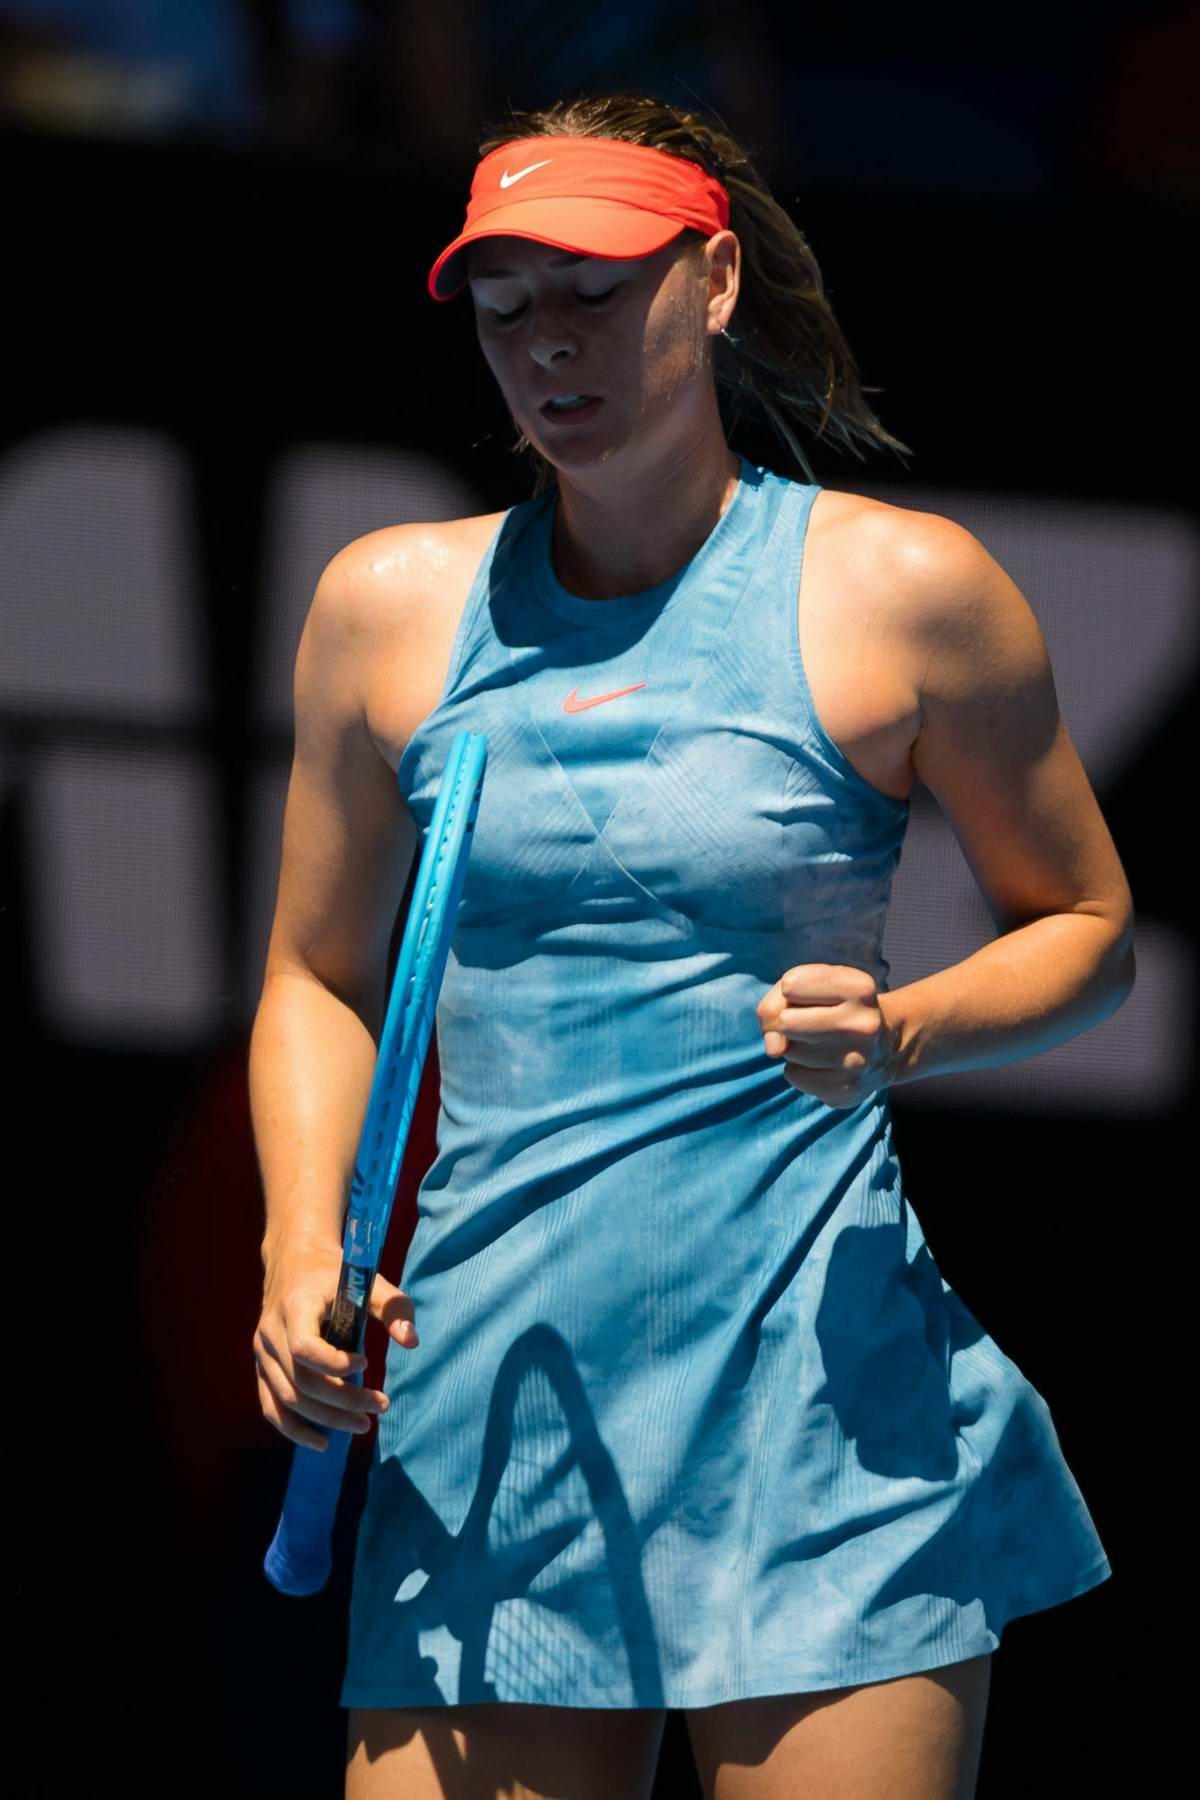 Maria Sharapova in action during the 2019 Australian Open in Melbourne, Australia